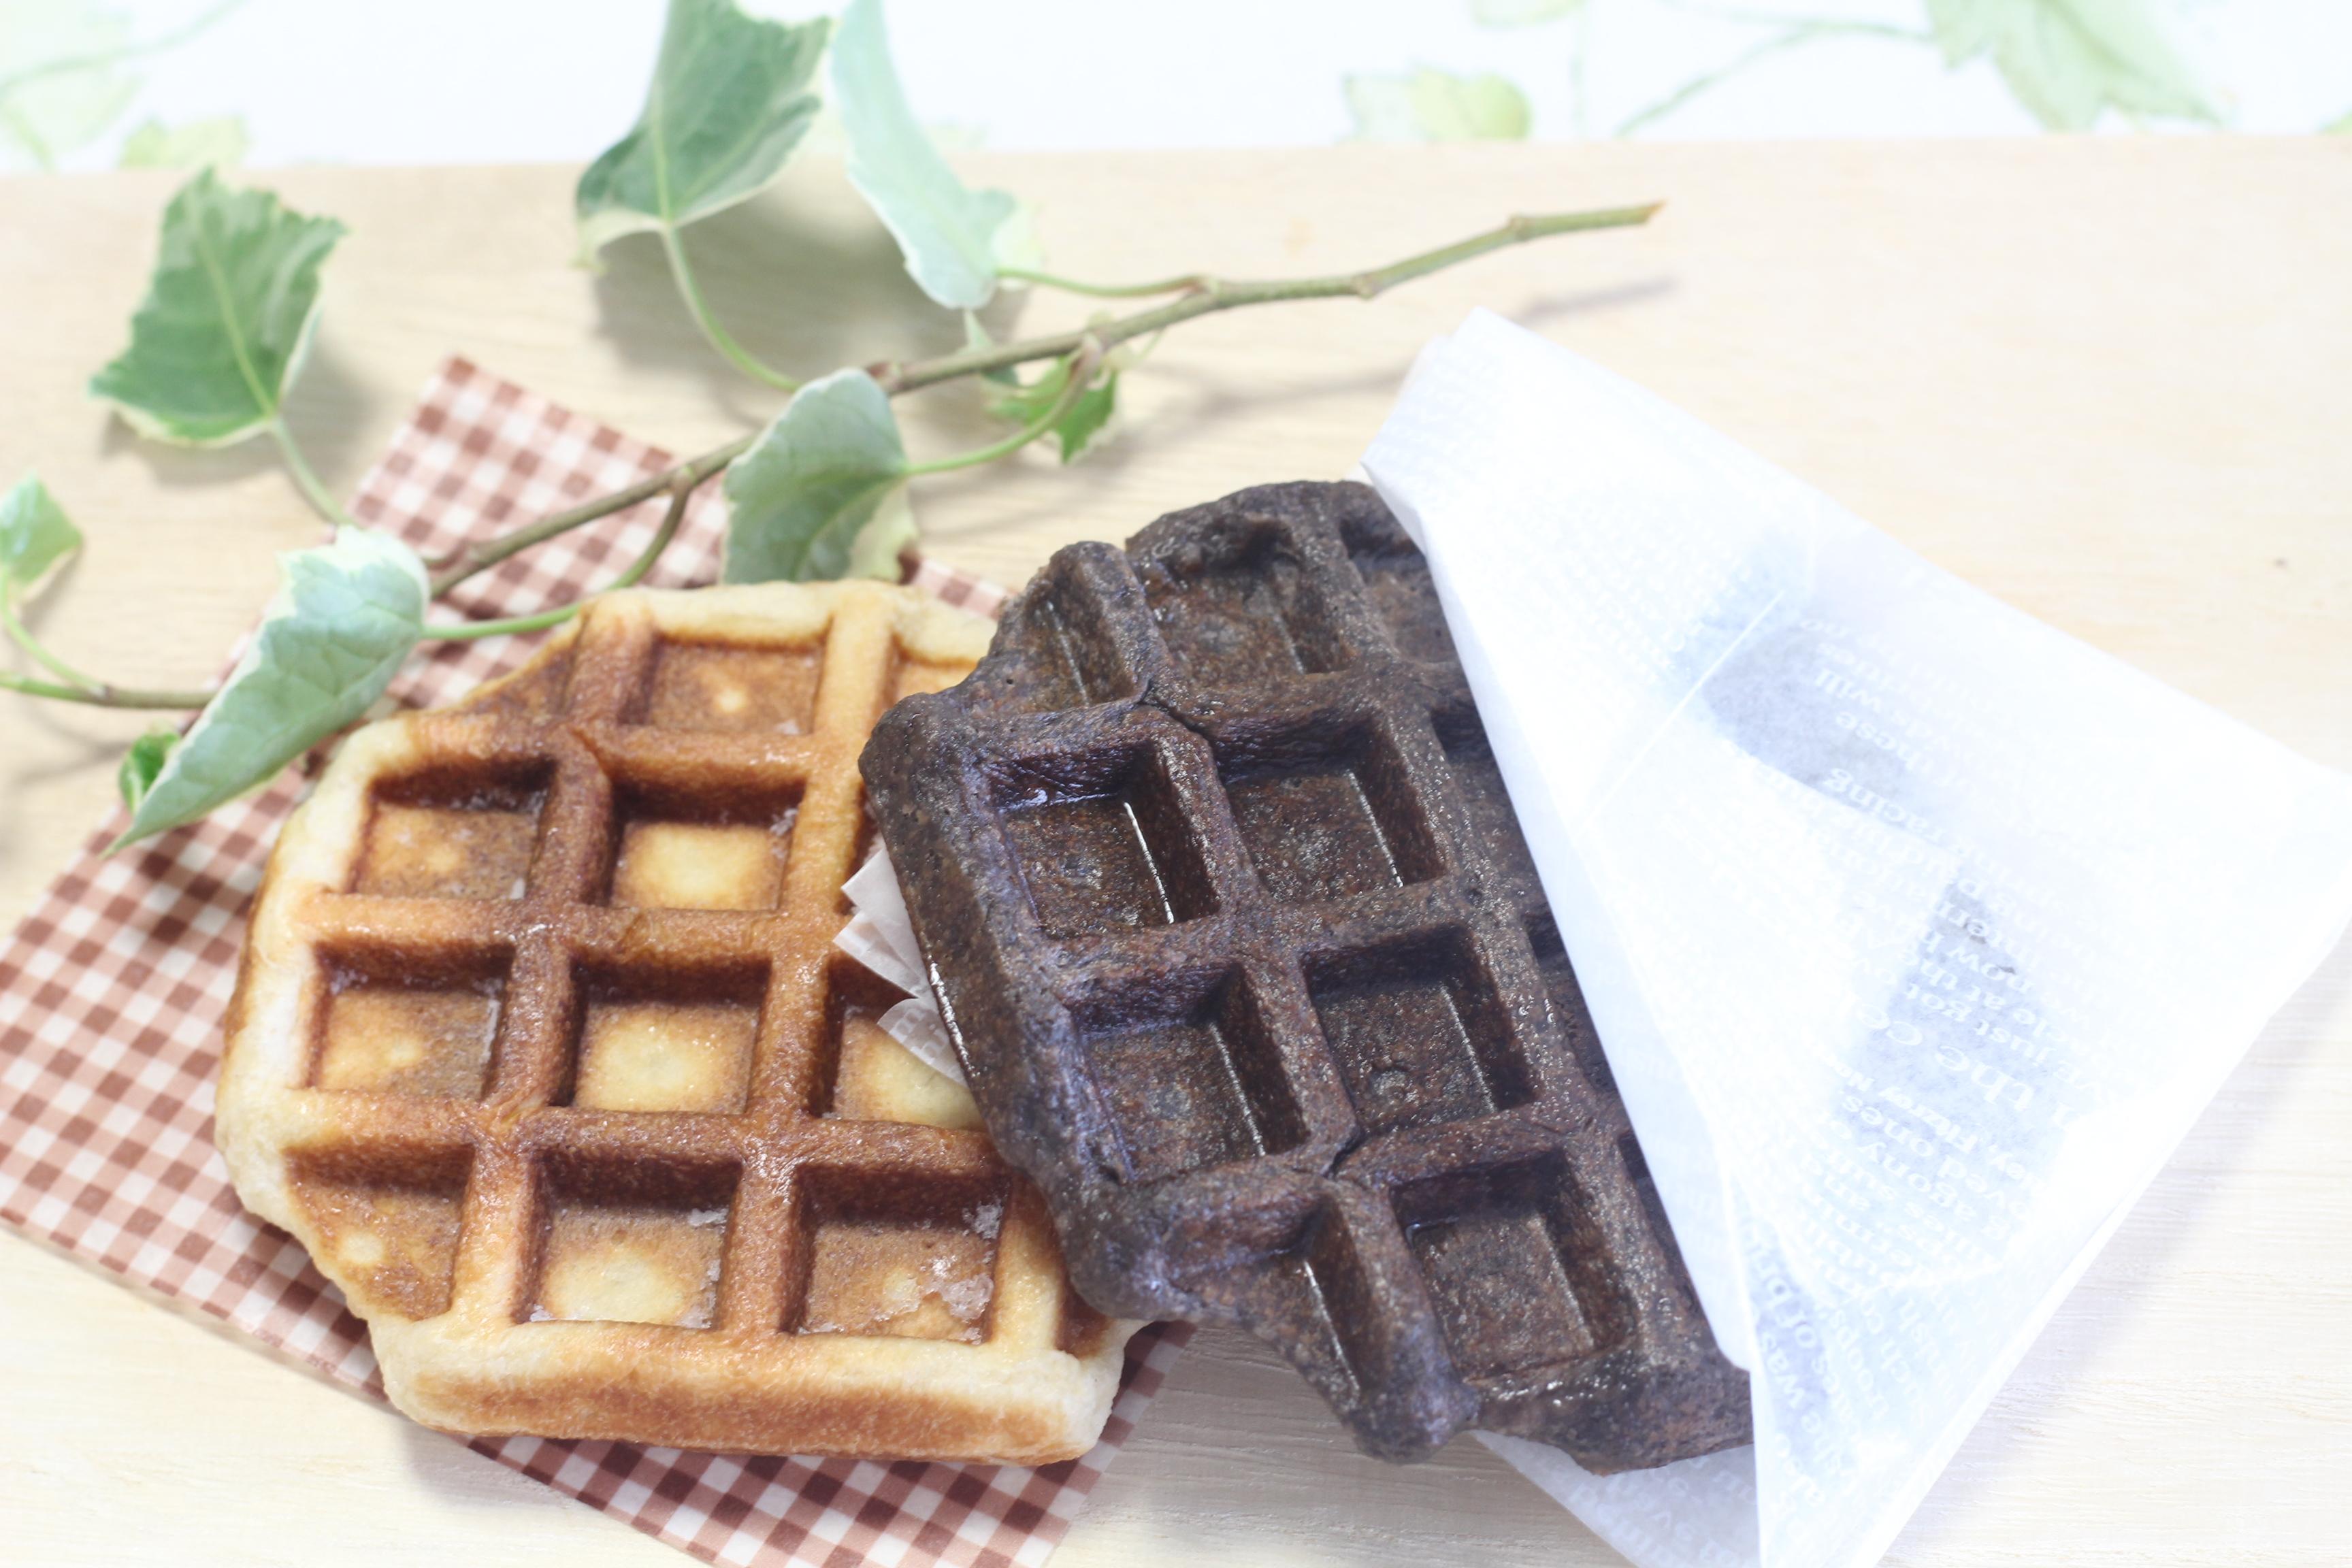 a-ta-sante糖質制限パン料理教室、阿倍野区西田辺。京都江部粉糖質制限『ワッフル』